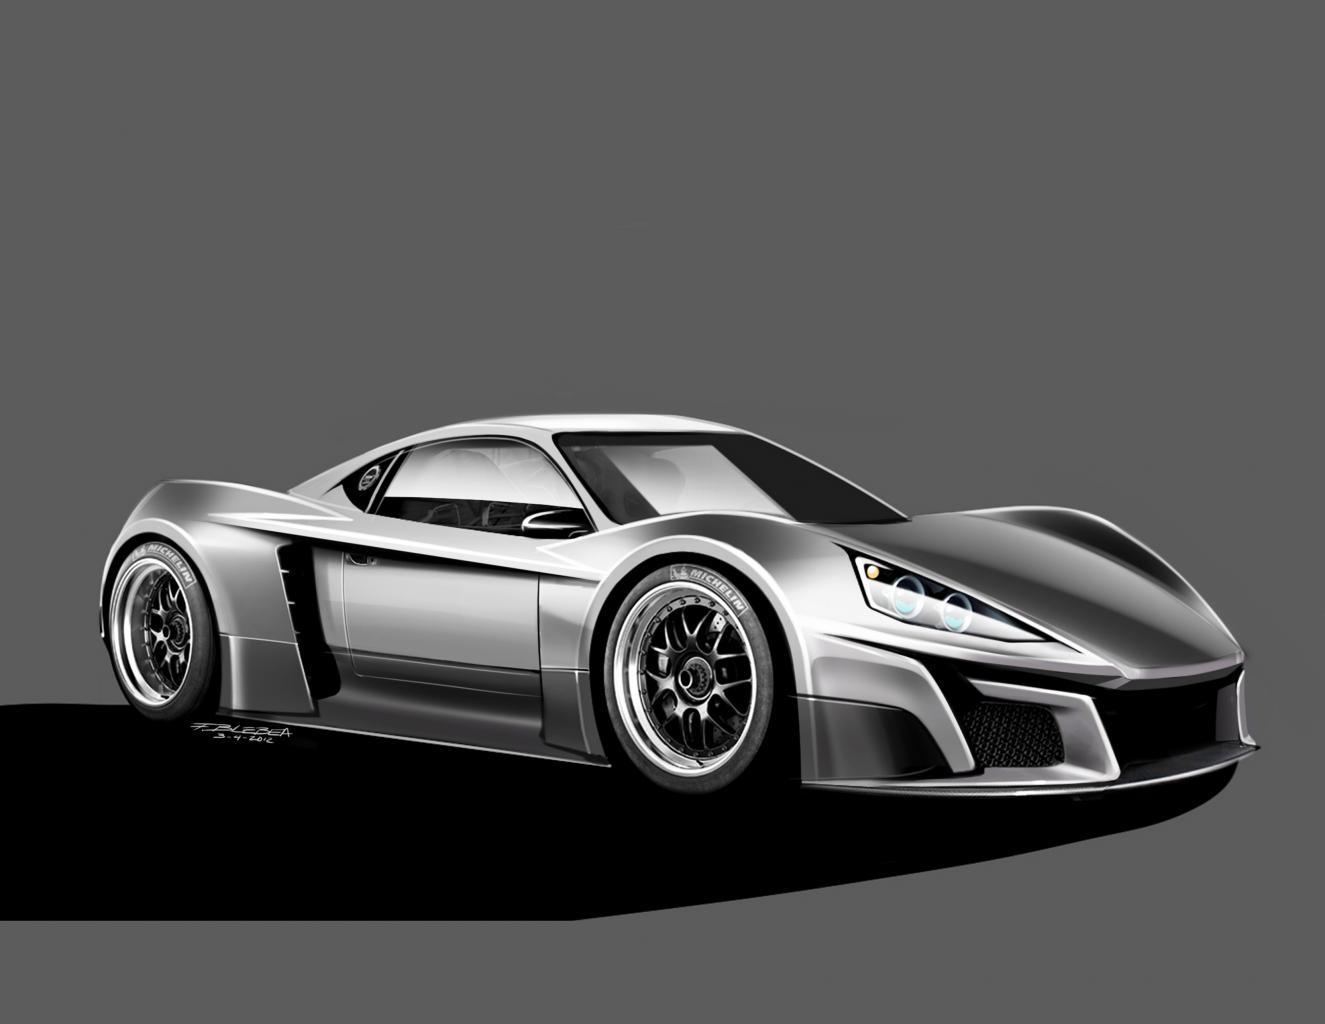 Superlite GTA-front-qtr-final-1-jpg